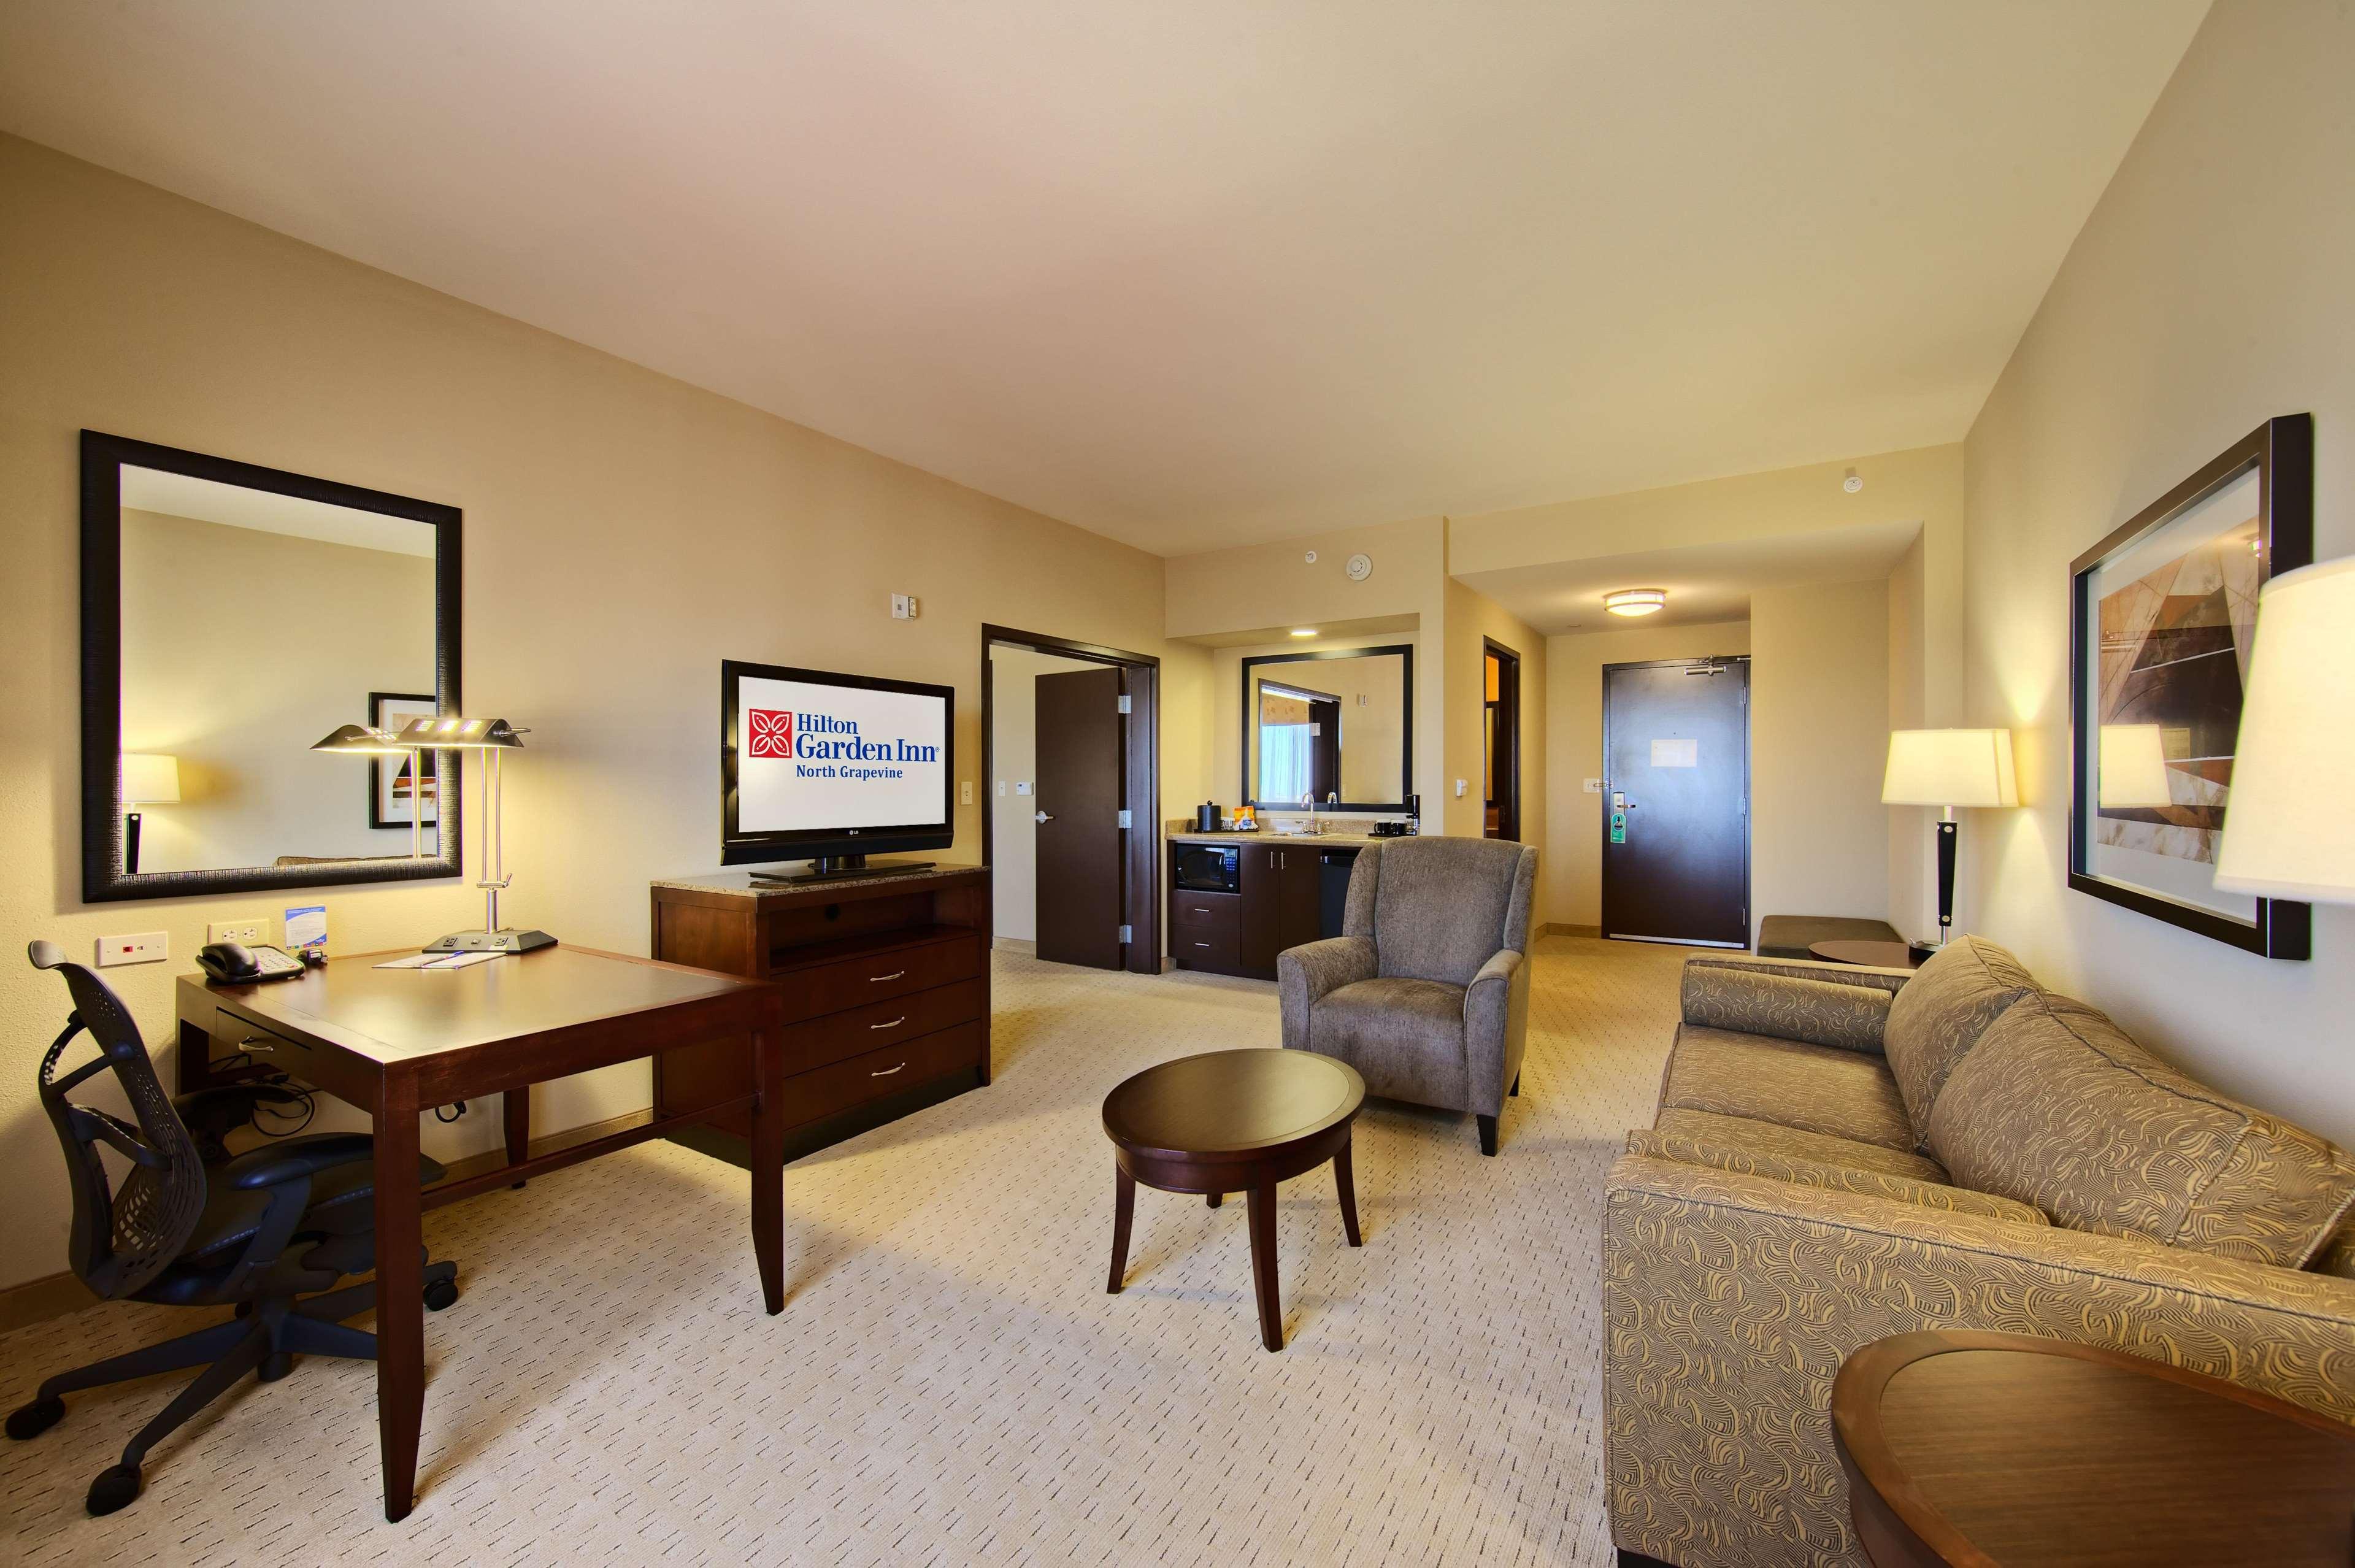 Hilton Garden Inn DFW North Grapevine image 19